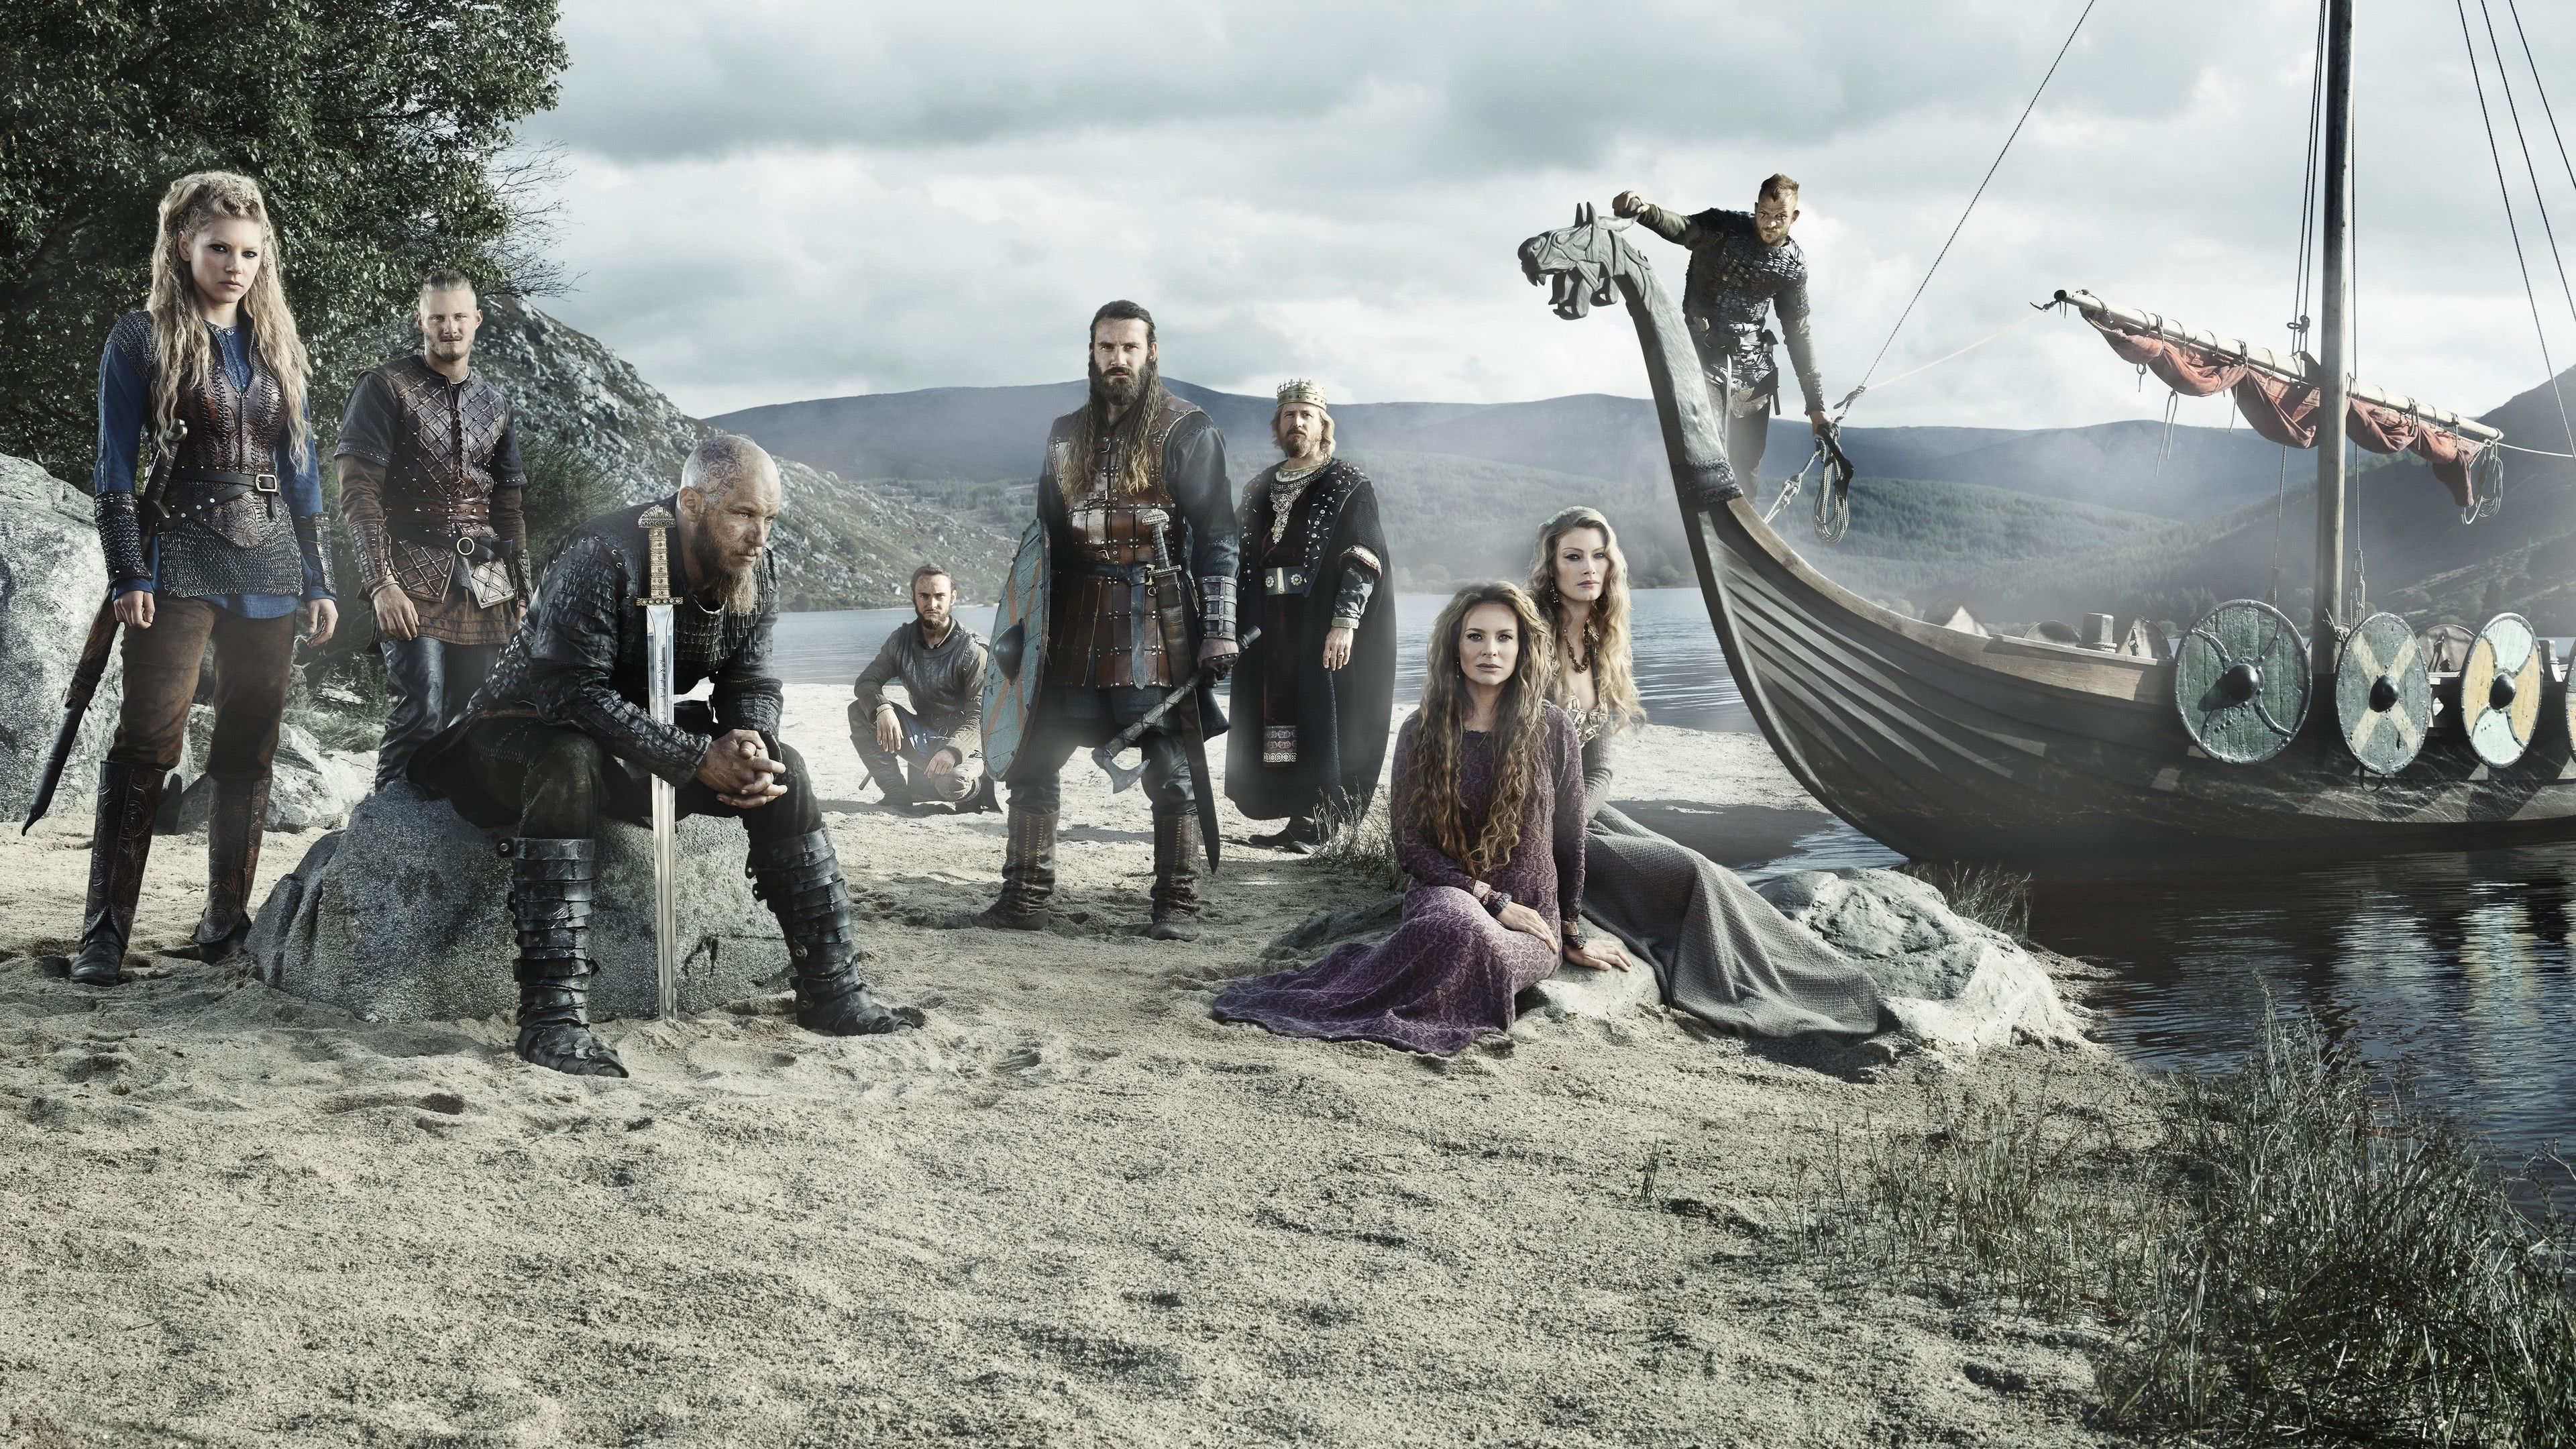 Vikings Characters UHD 4K Wallpaper | Pixelz